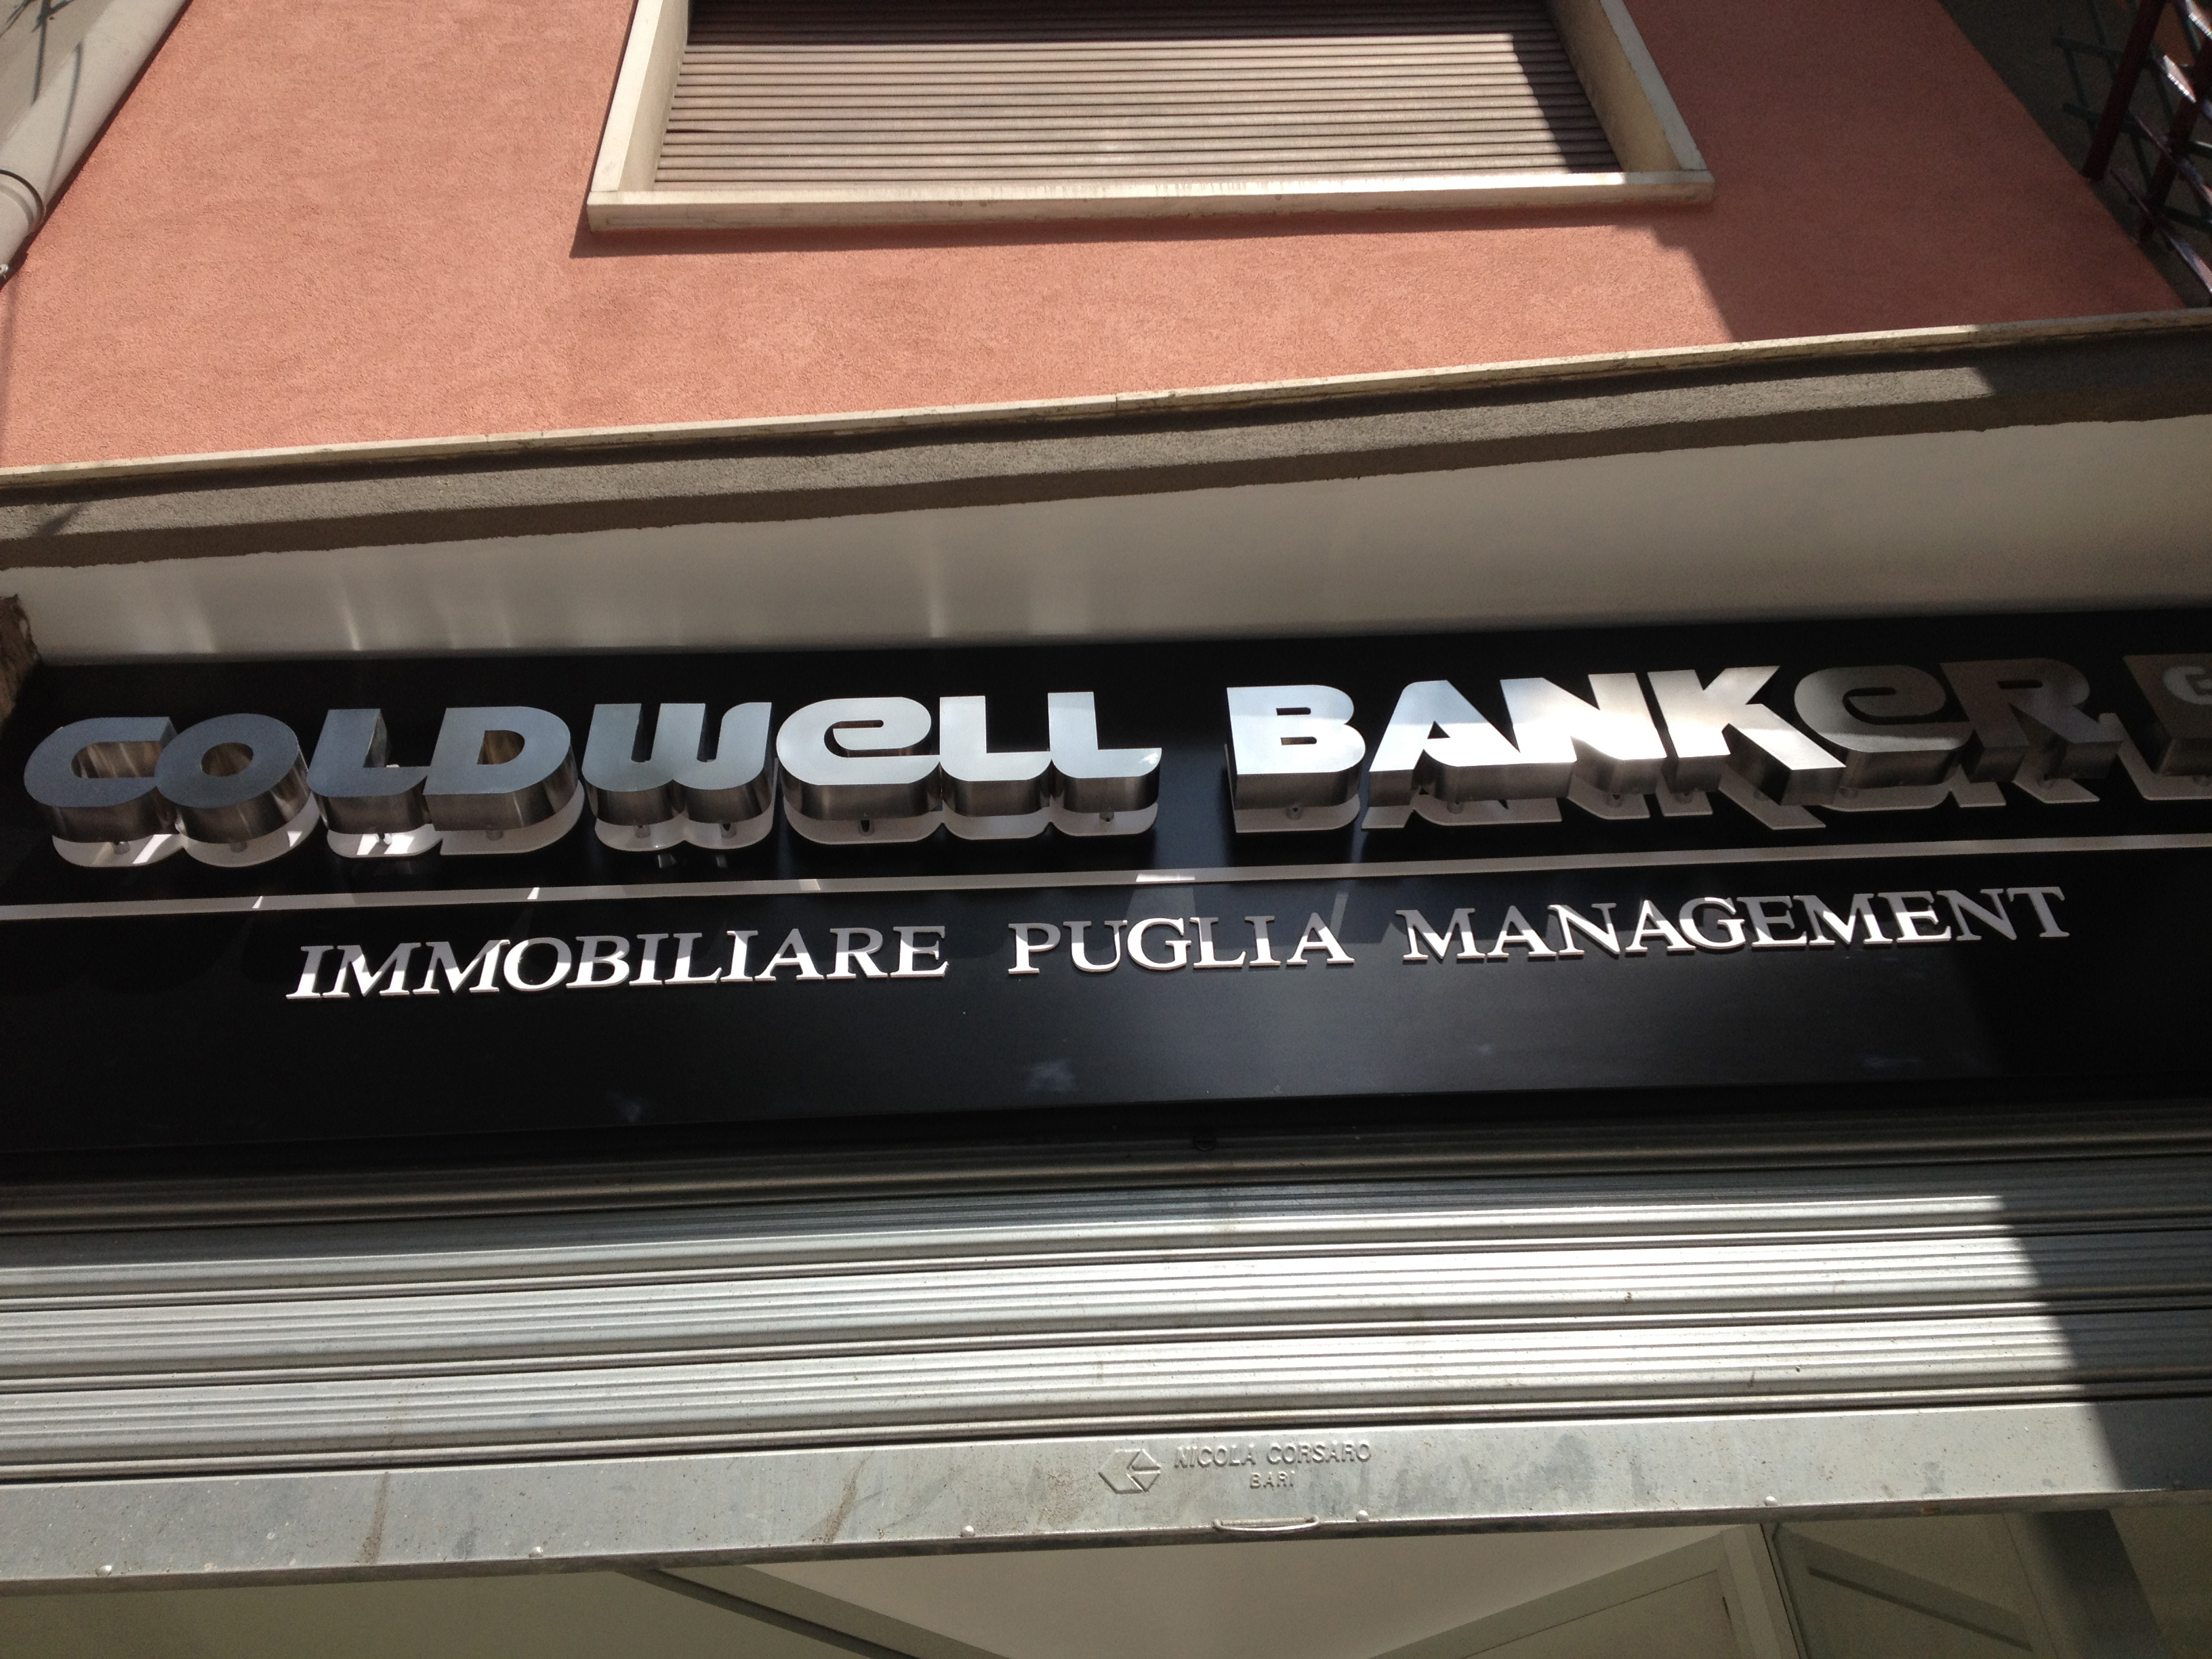 Goldwell Bank